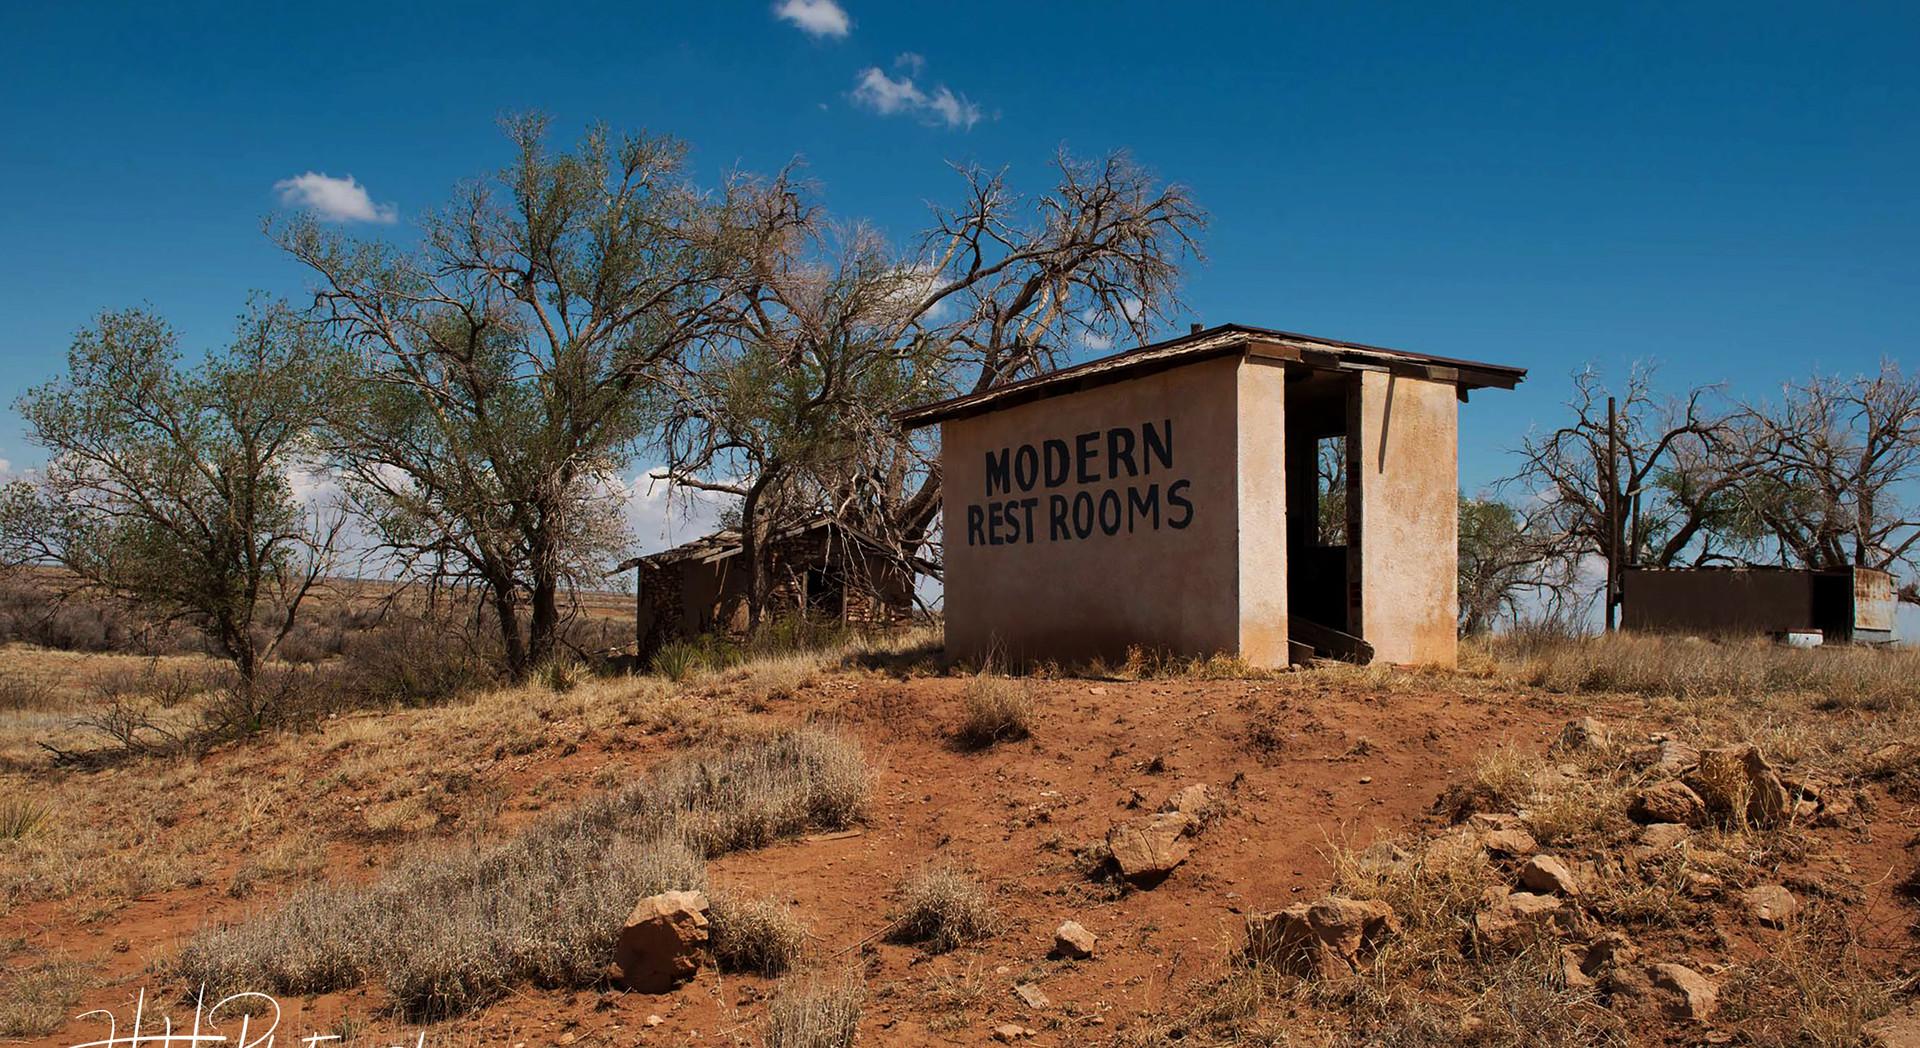 #modern_restrooms 1